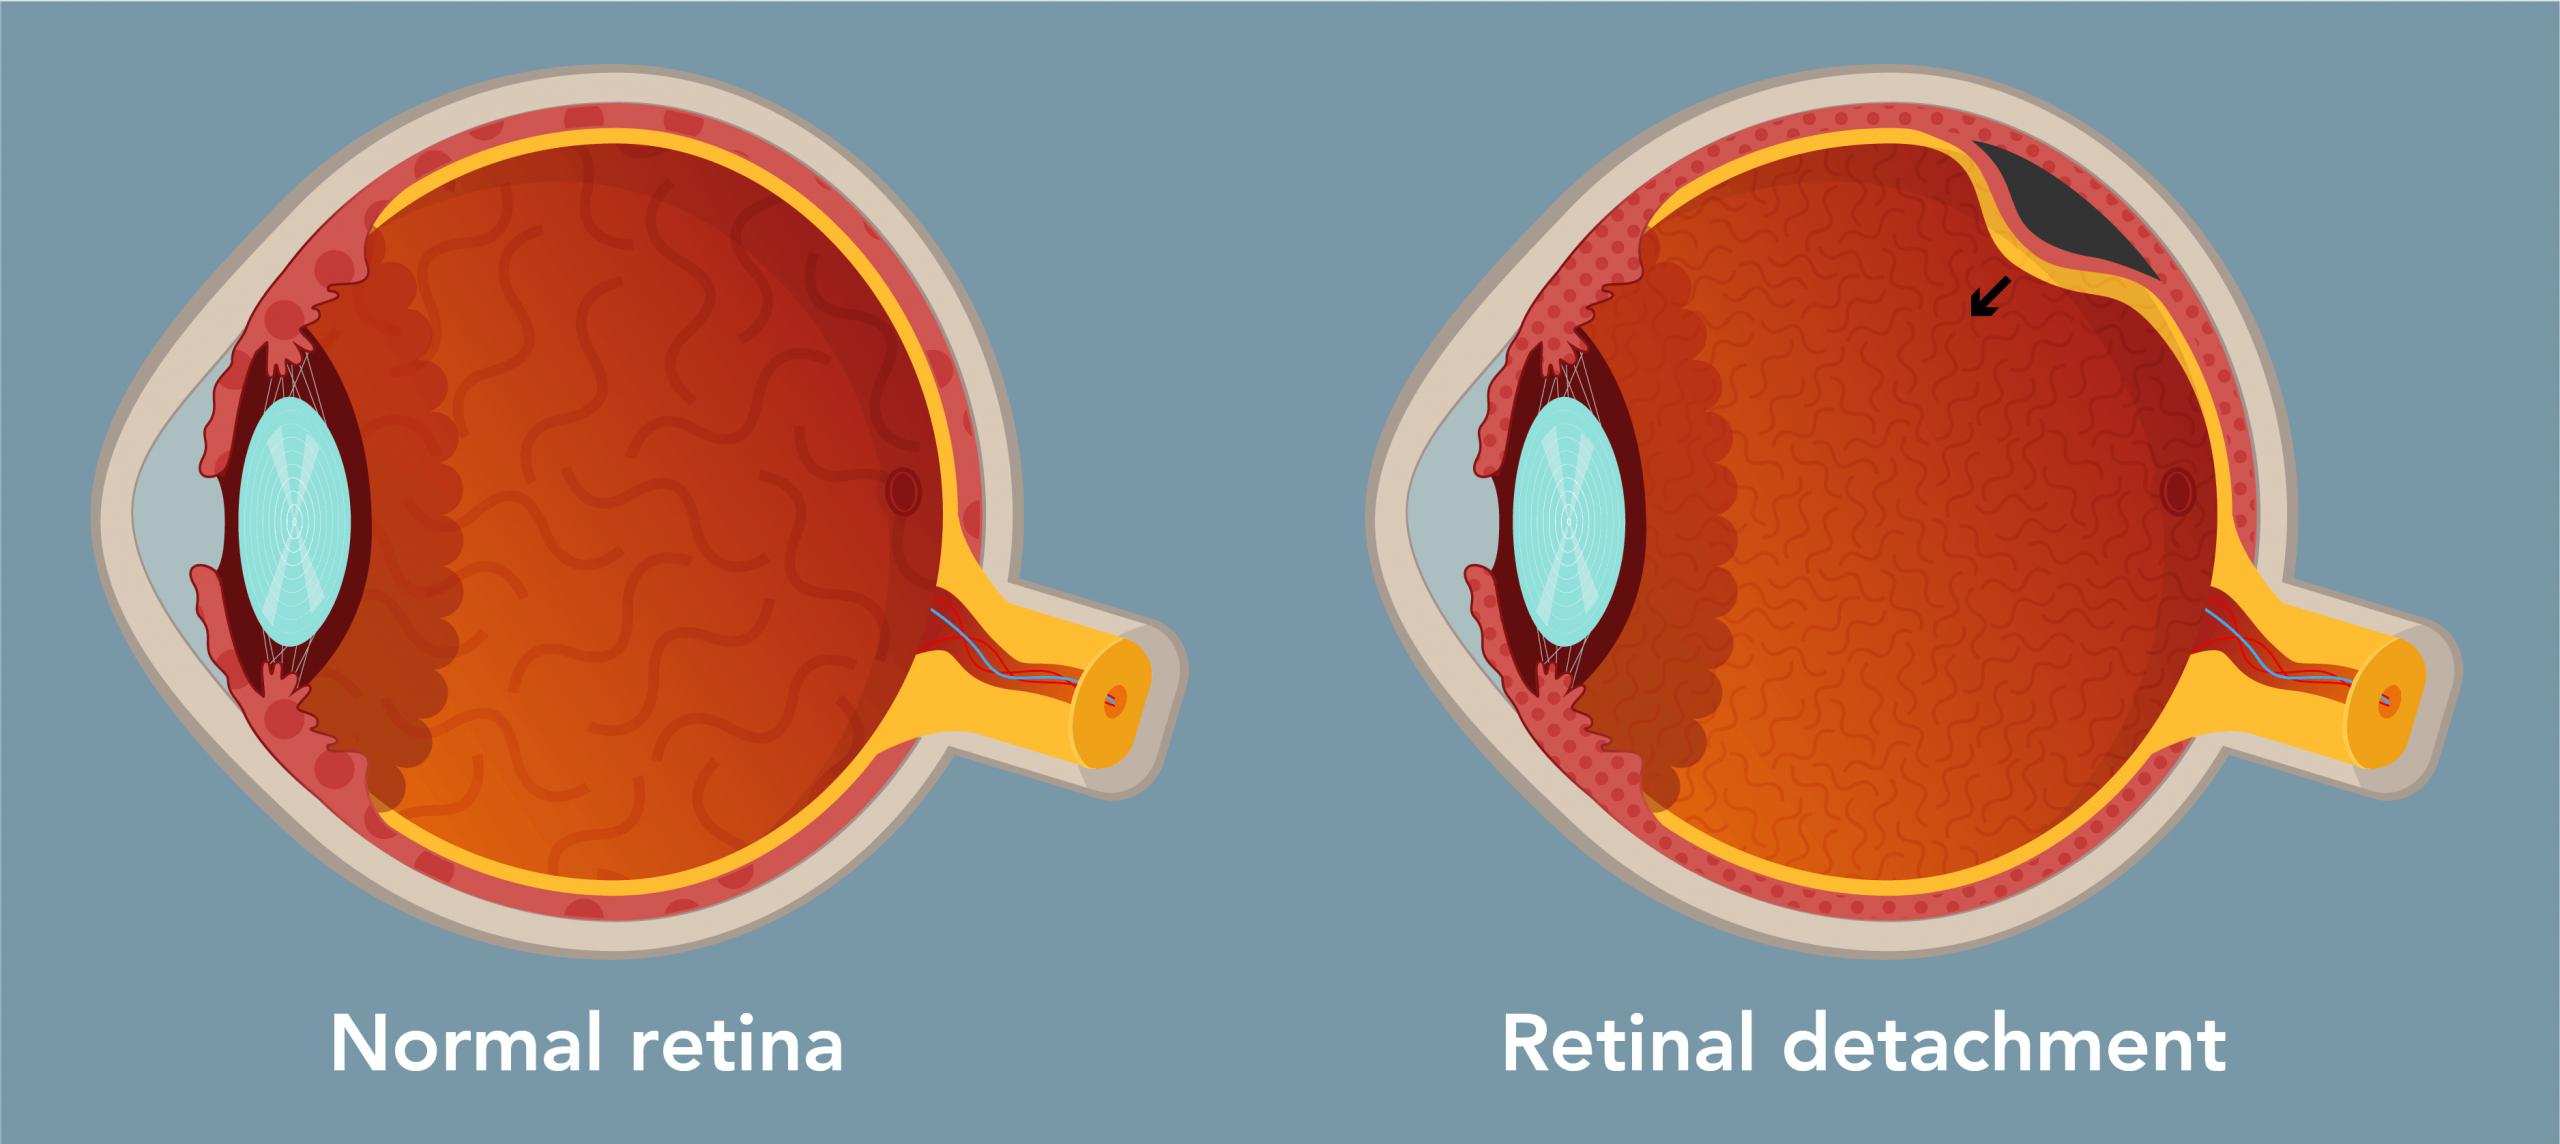 Surgery_Web_ENG_Retinal detachment